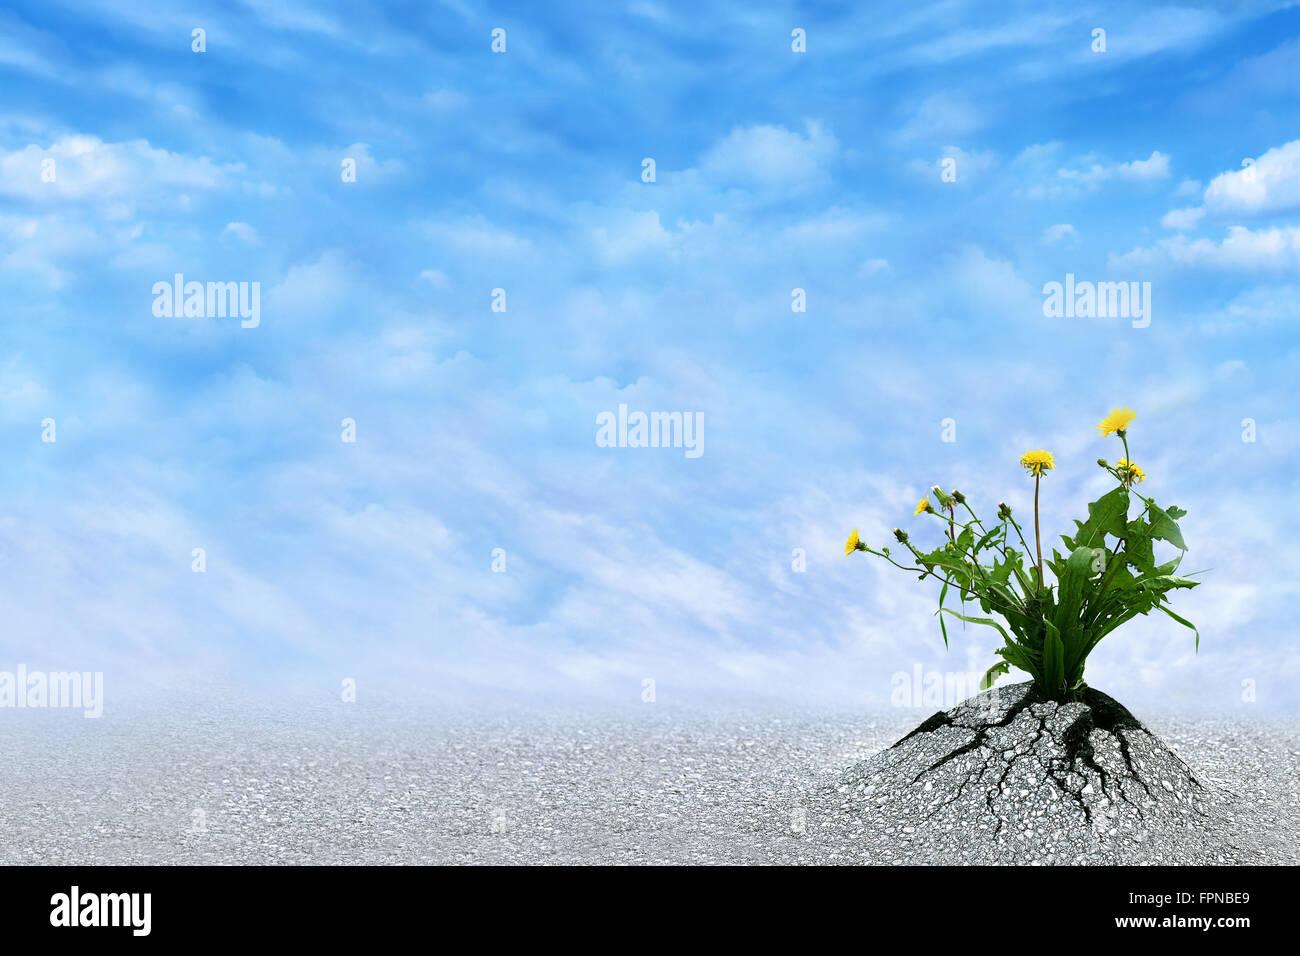 life persists inspirational image for presentations regarding stock